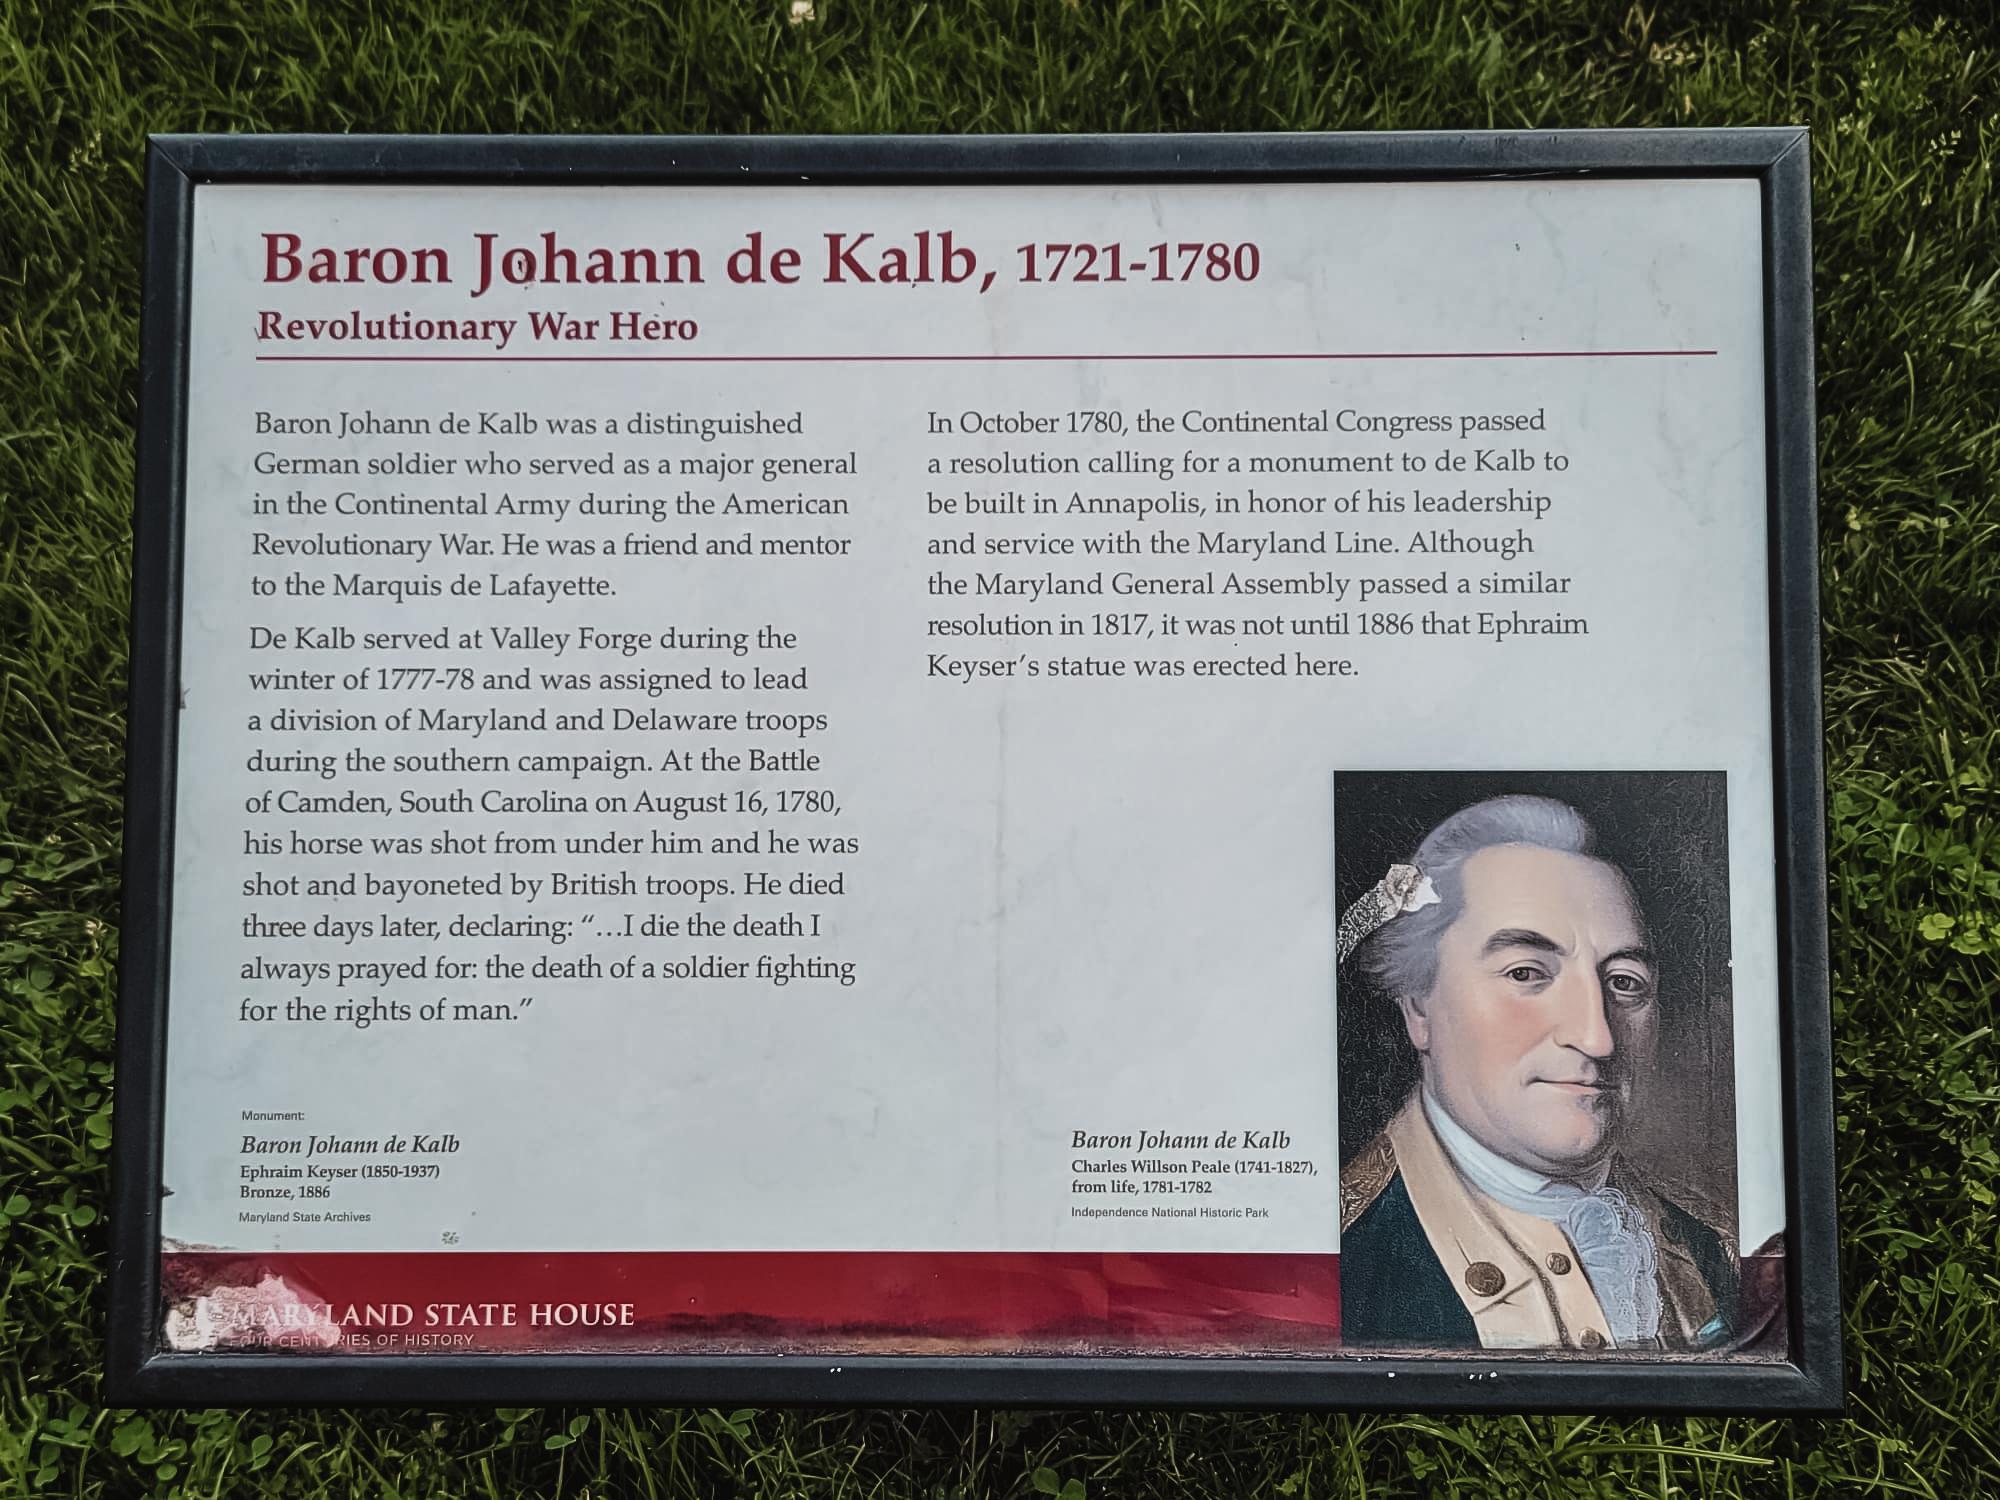 Plaque of Johann de Kalb in Annapolis Maryland